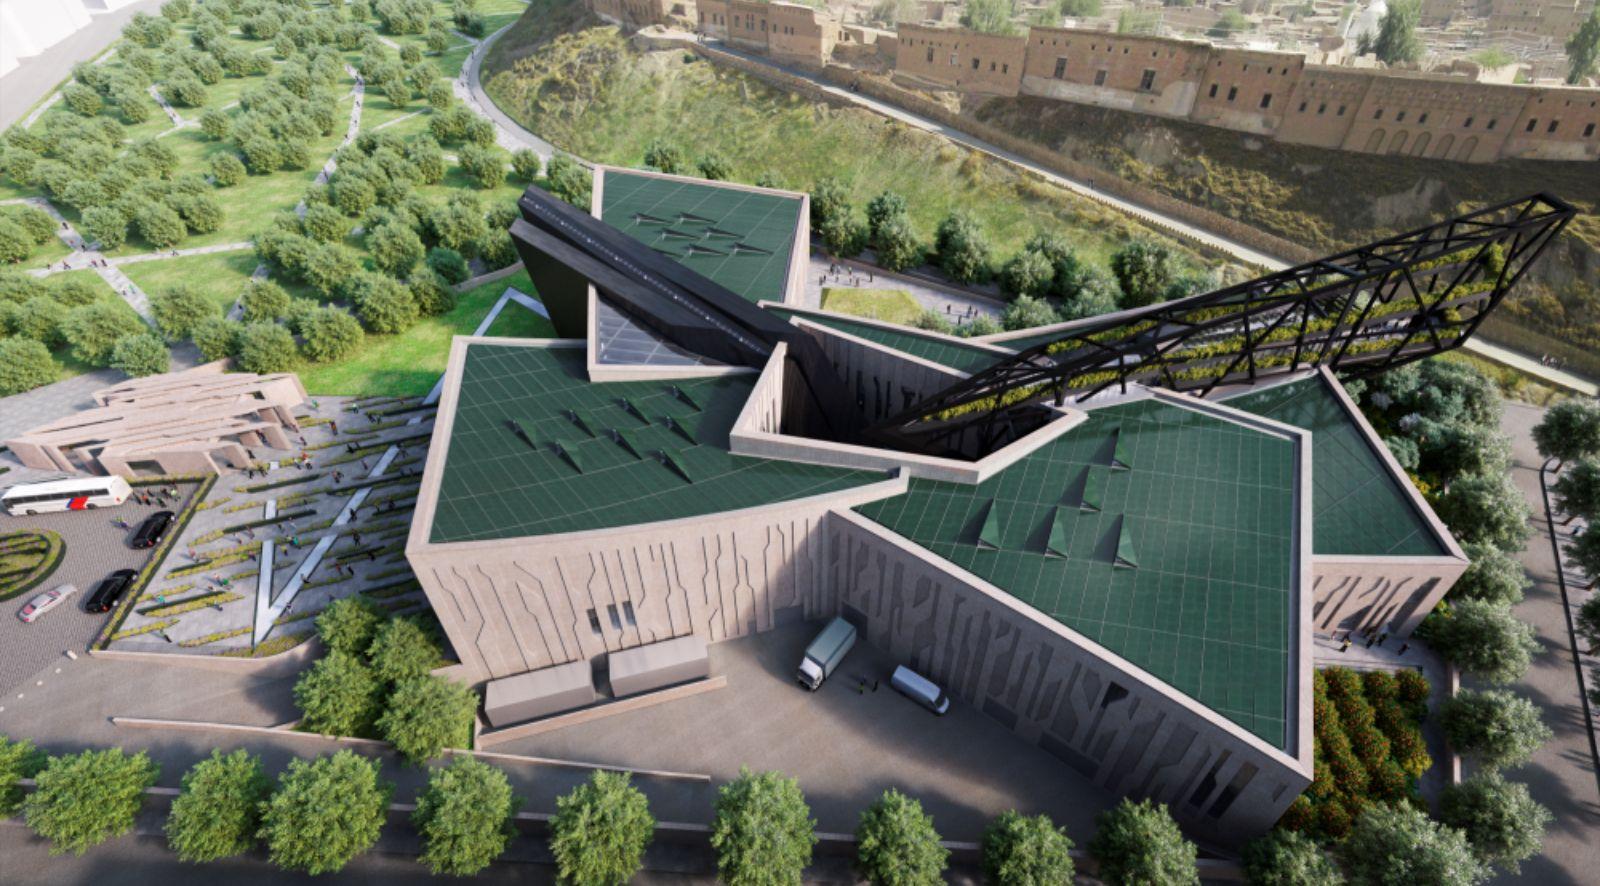 The Kurdistan Museum in Erbil